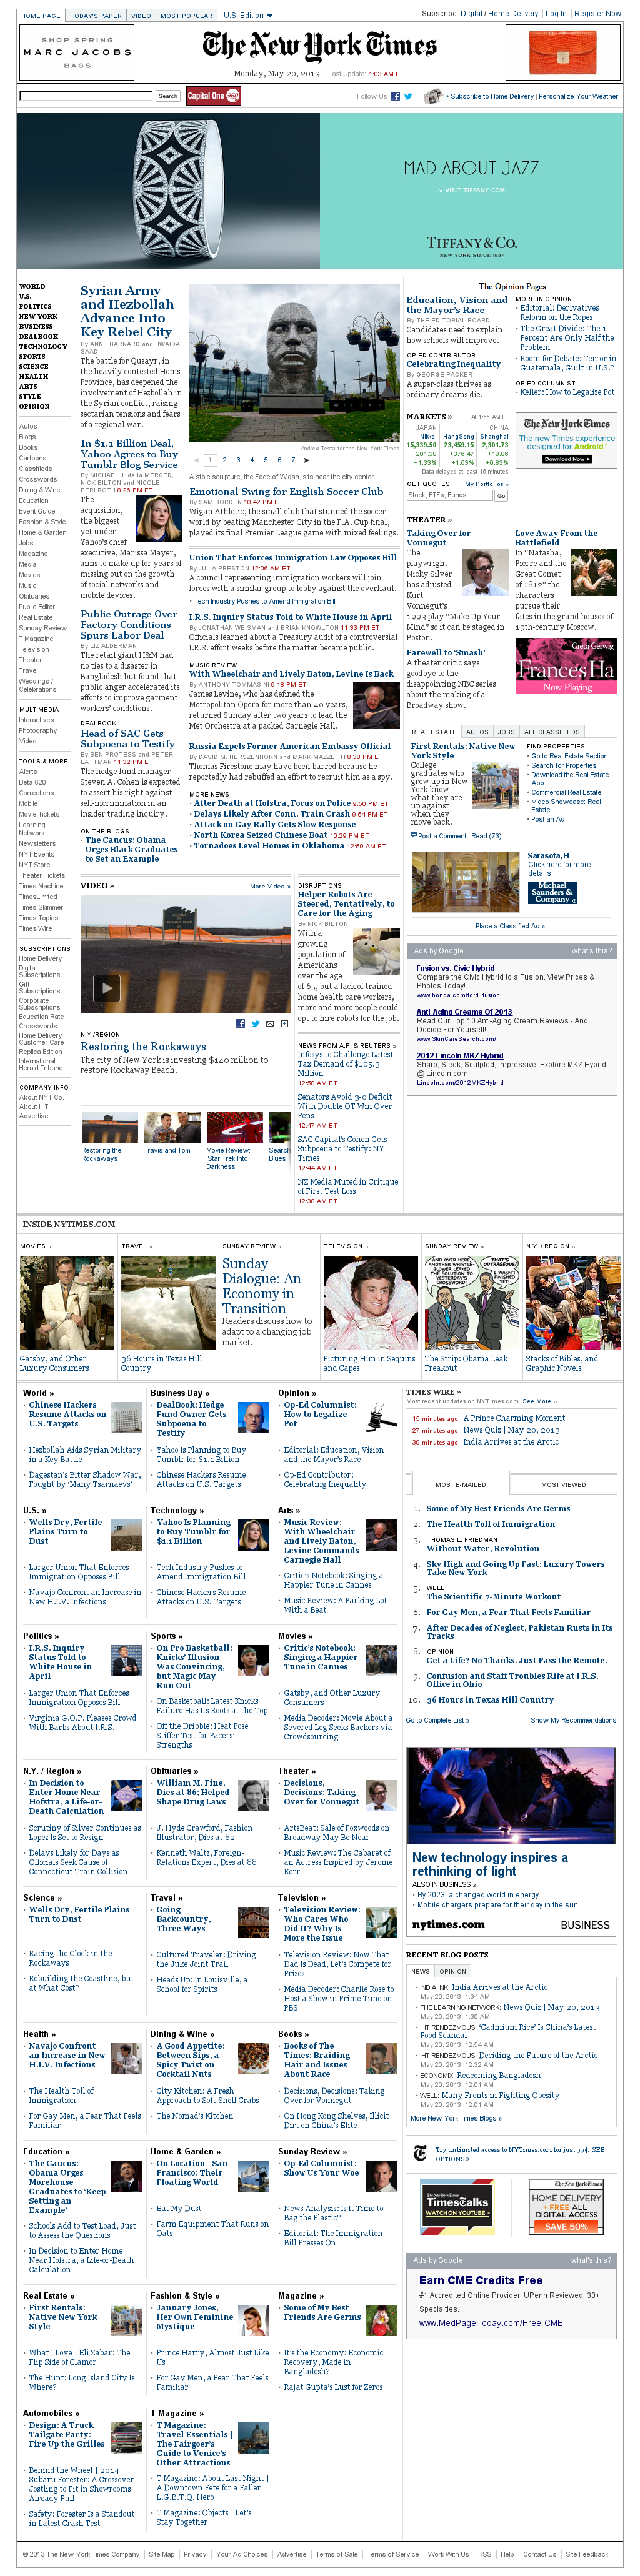 The New York Times at Monday May 20, 2013, 6:16 a.m. UTC